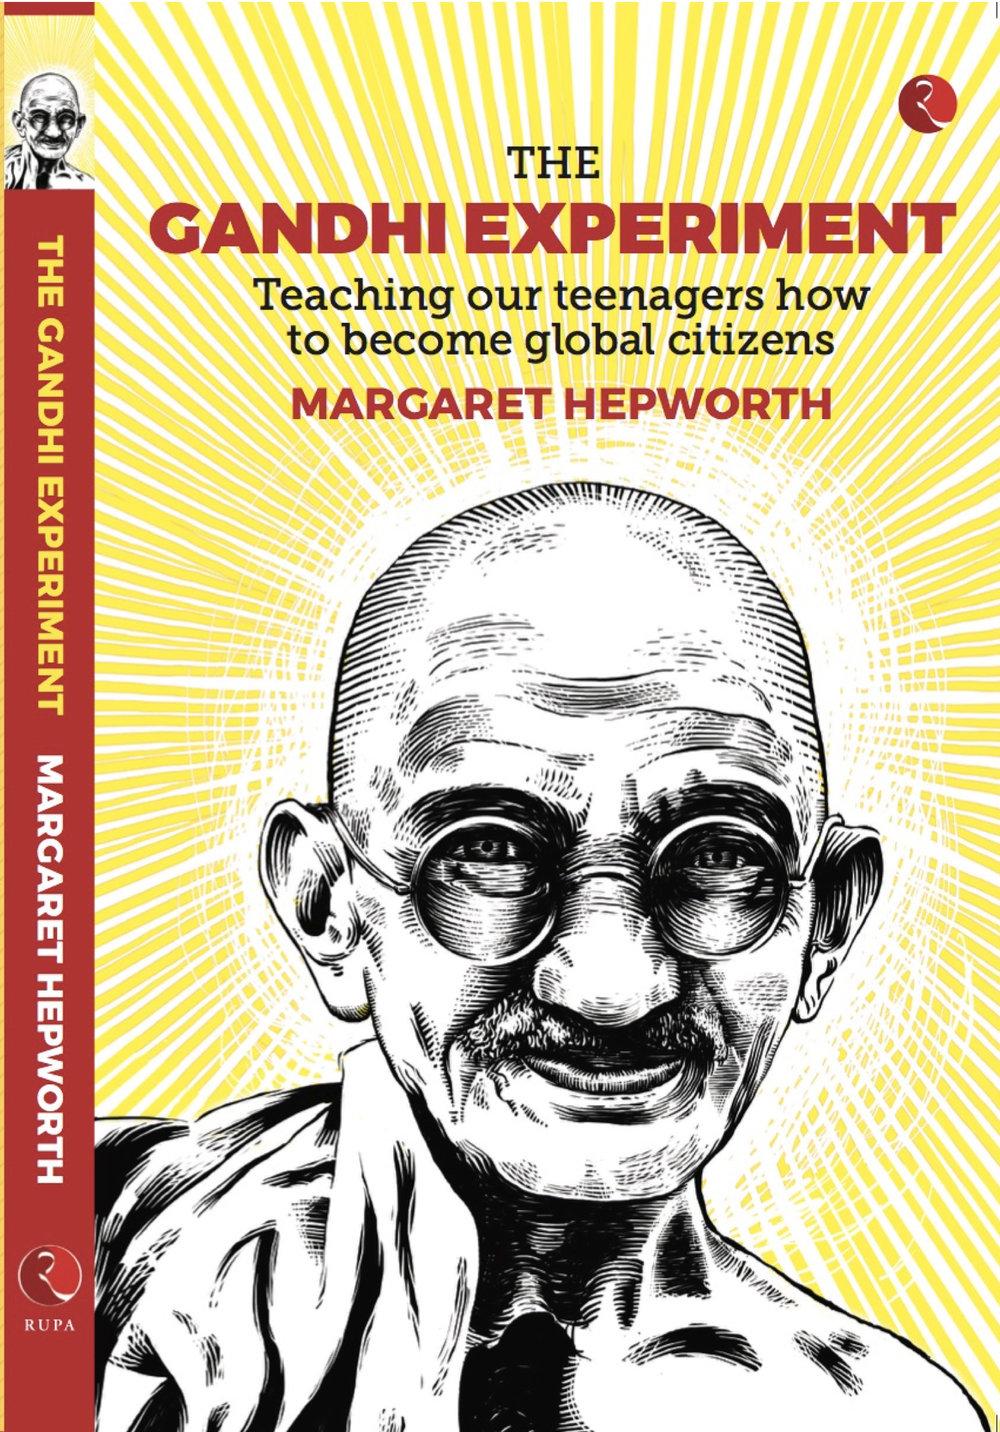 The Gandhi Experiment book Margaret Hepworth.jpeg